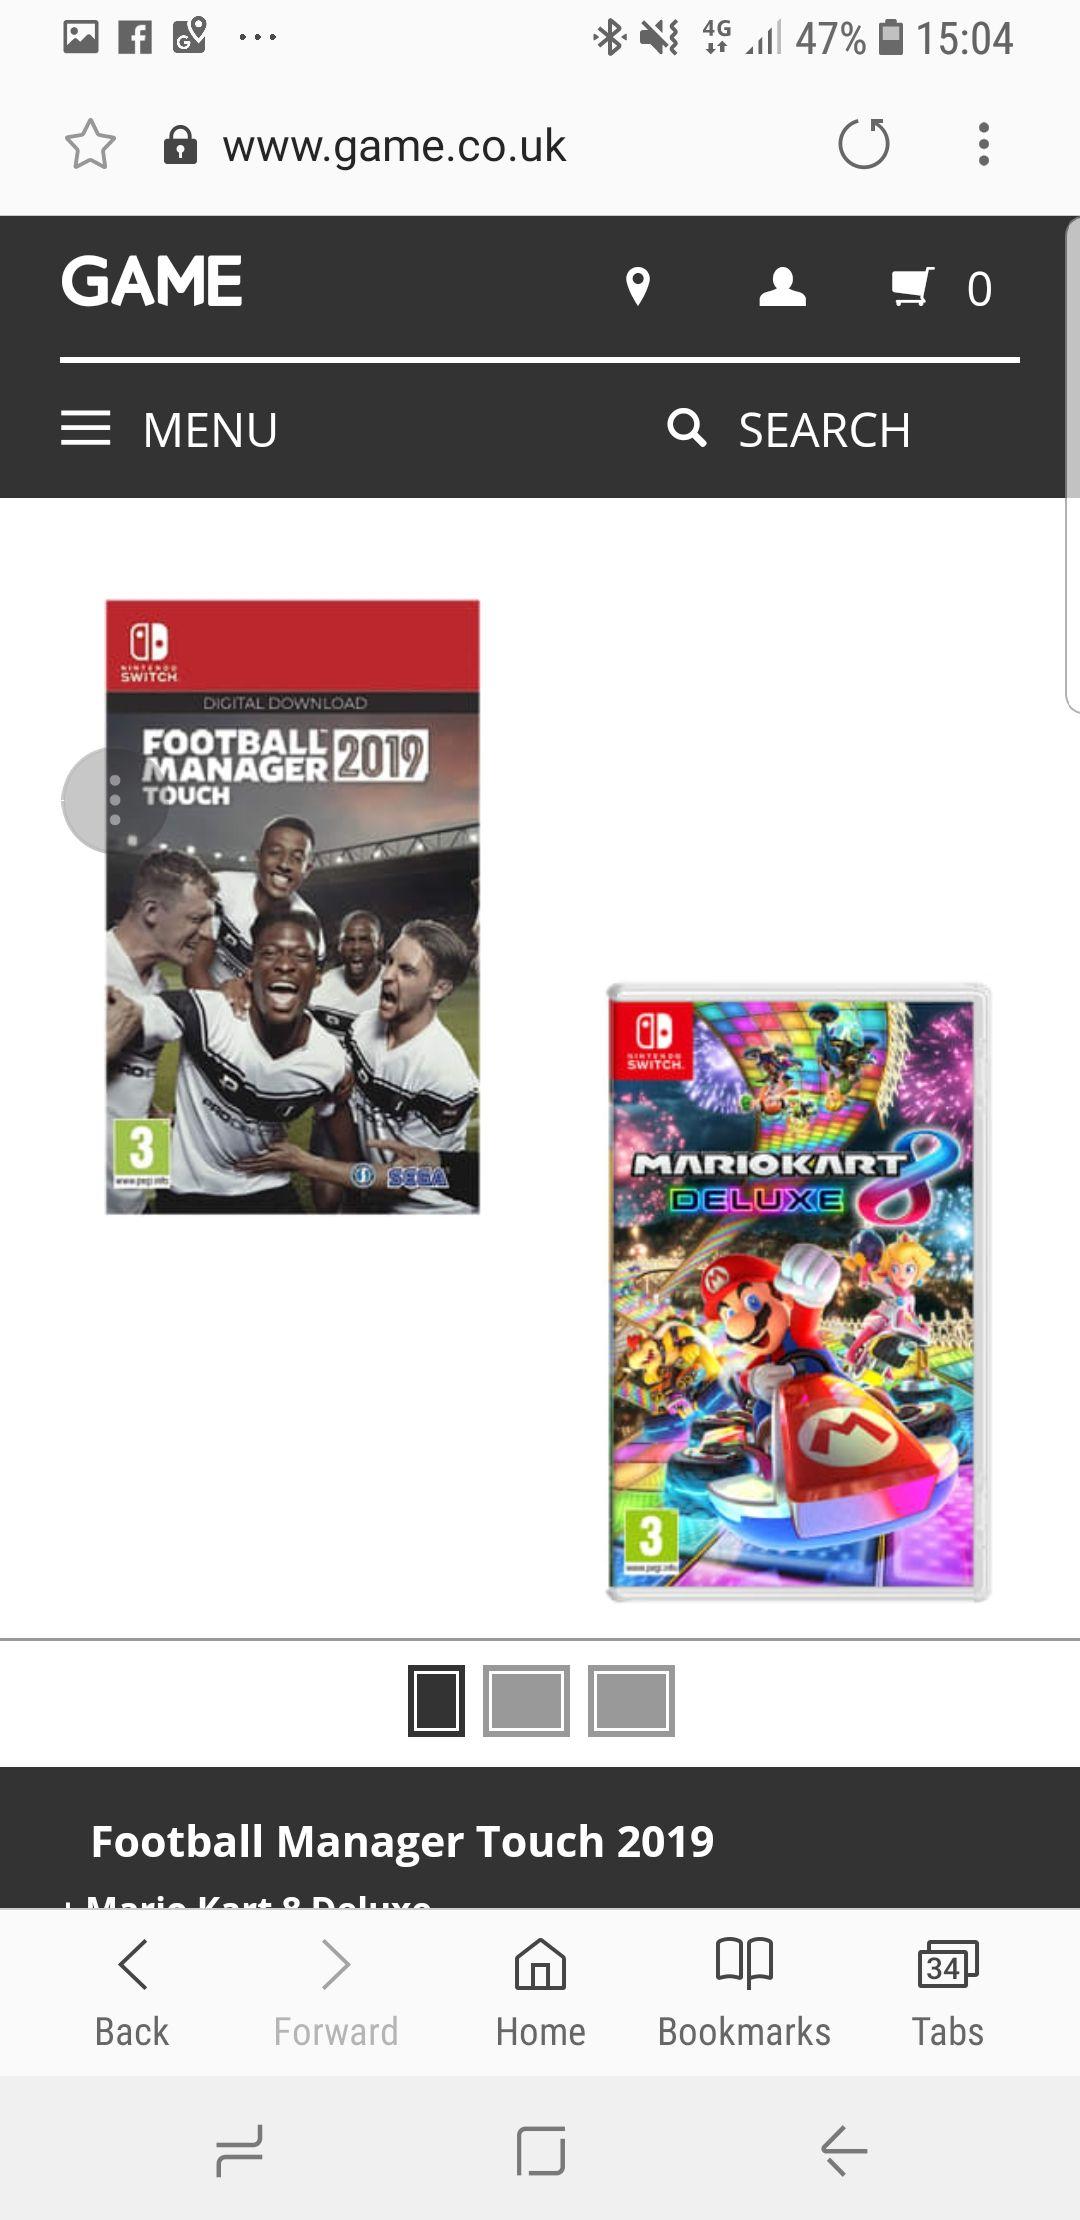 Mario Kart 8 + Football Manager Nintendo Switch - £61.98 @ Game